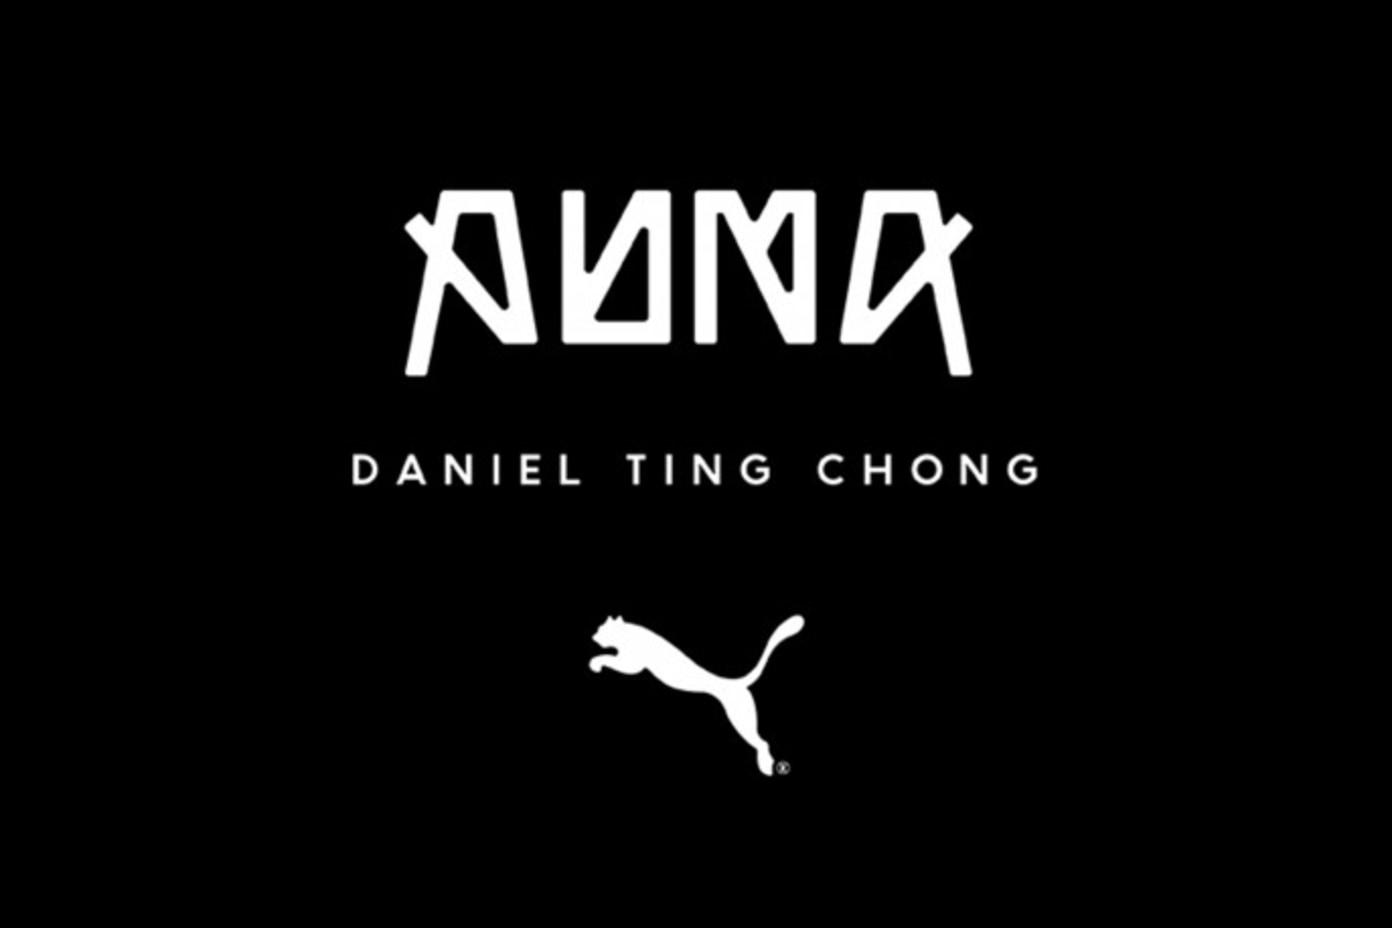 PUMA x Daniel Ting Chong